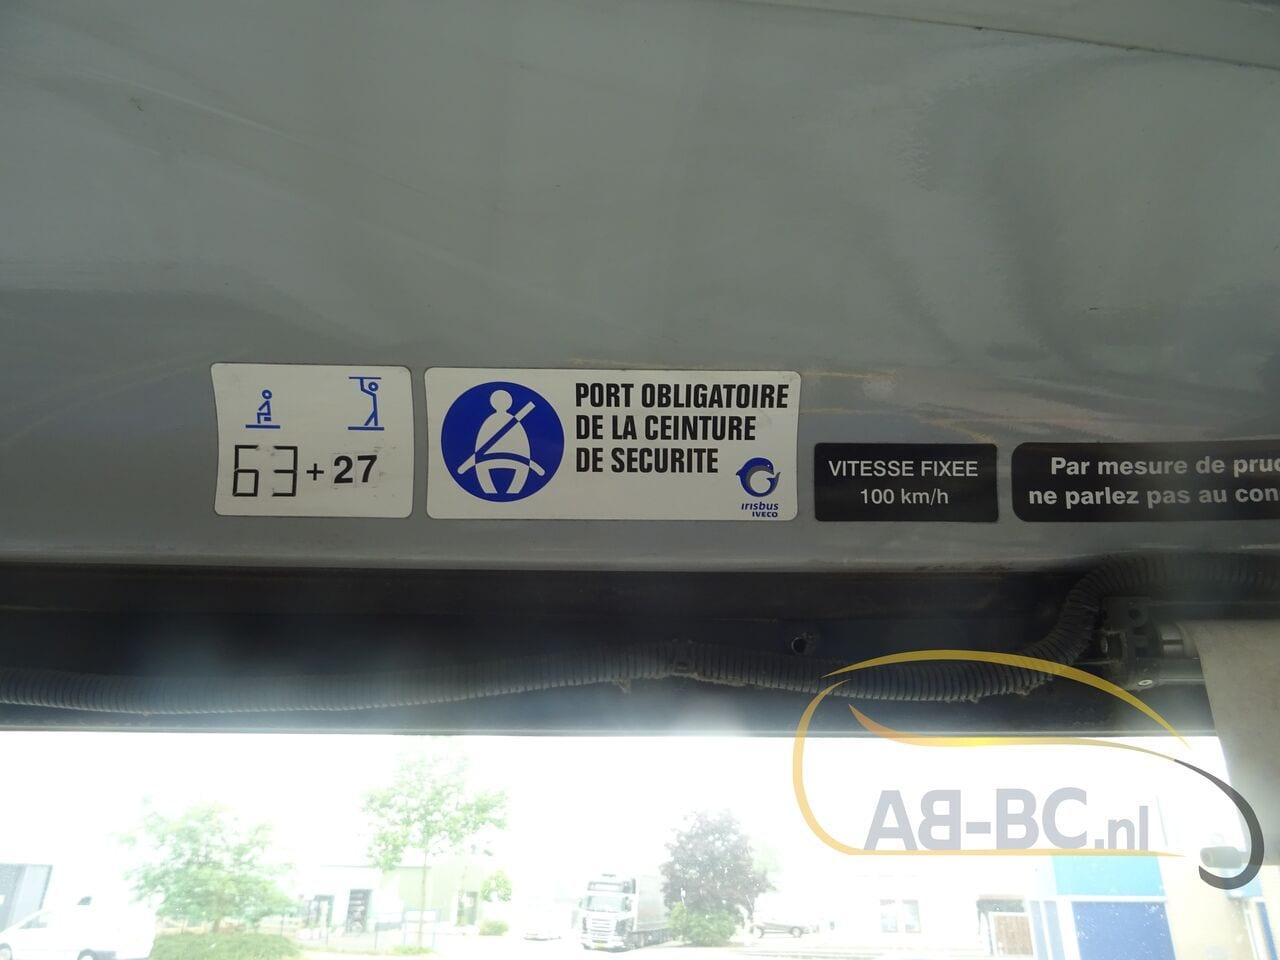 interurban-busIVECO-Irisbus-Recreo-64-Seats---1626160080267566911_big_946f028df2f0c2aadc57e305f7d1f9c6--21071309575983154500